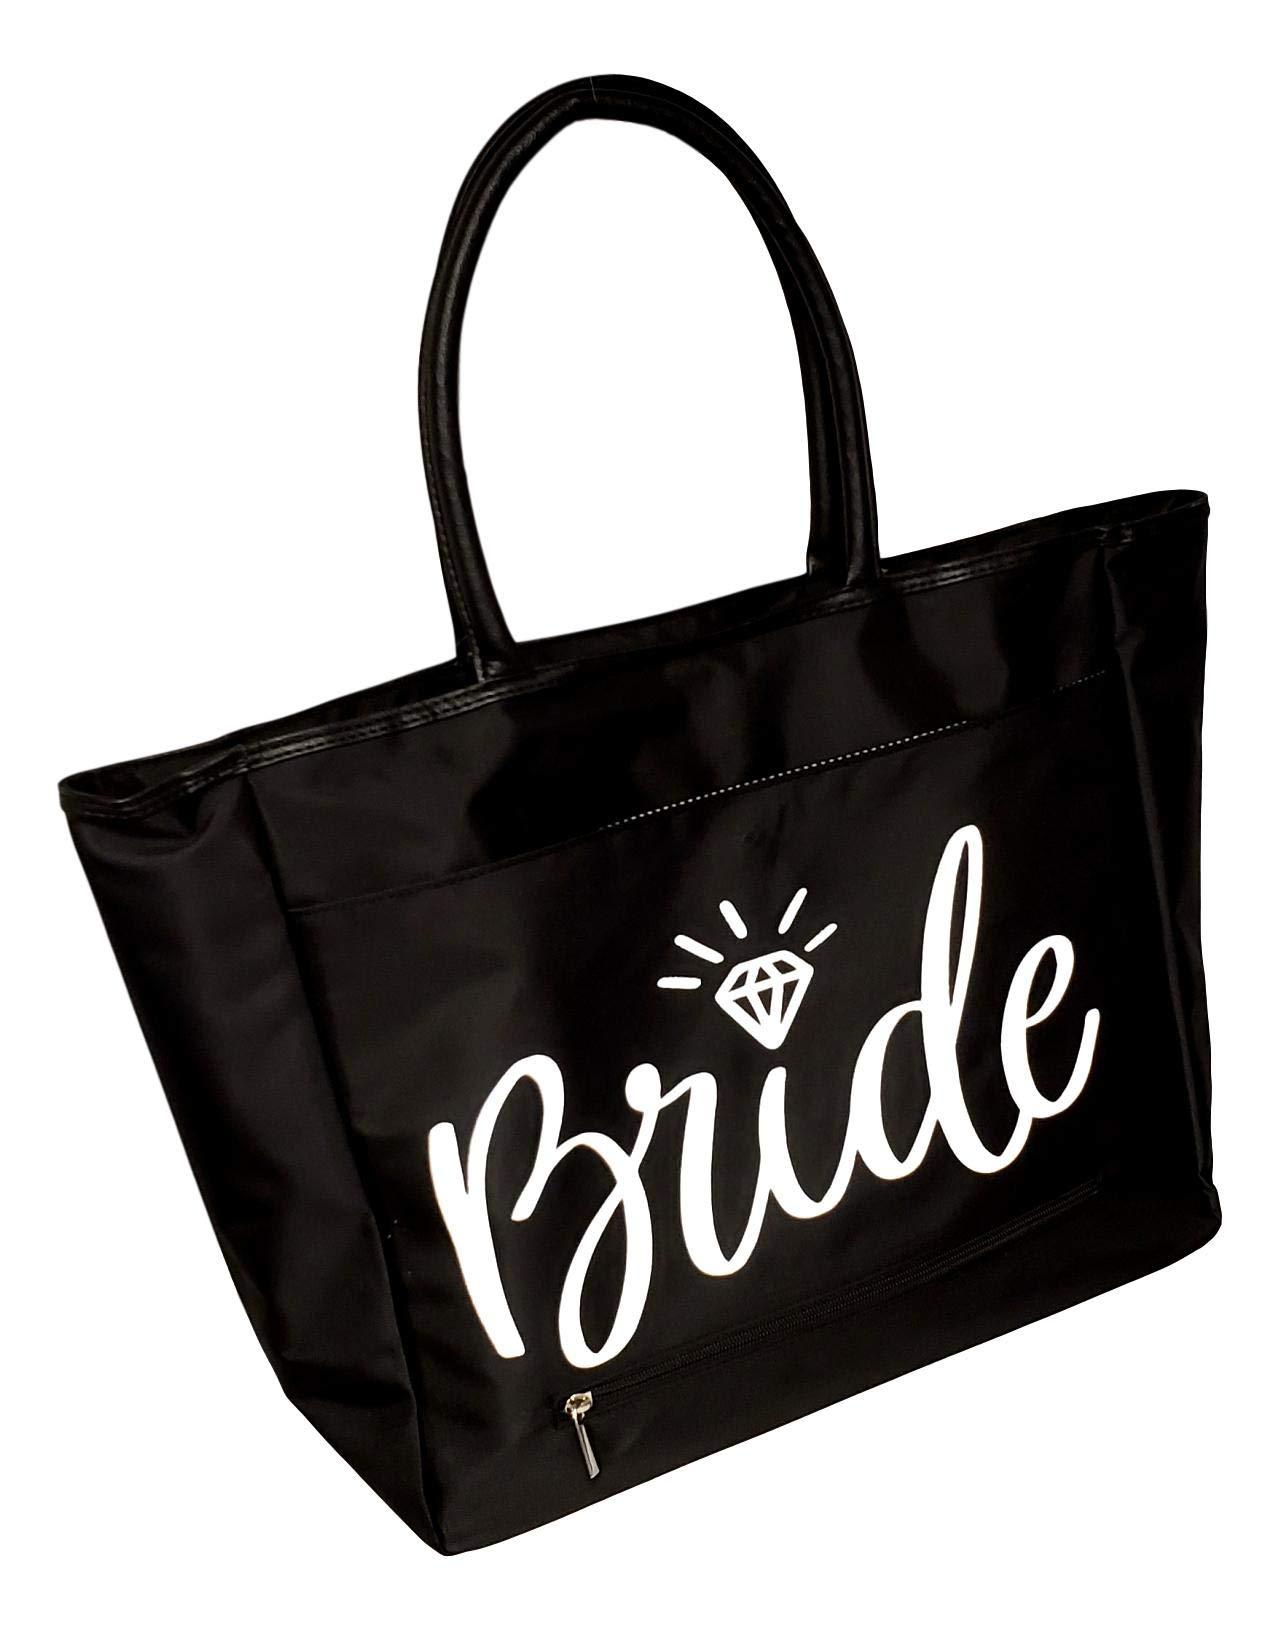 Bridal Bride Large Black Organizing Travel Companion Purse Handbag Bag